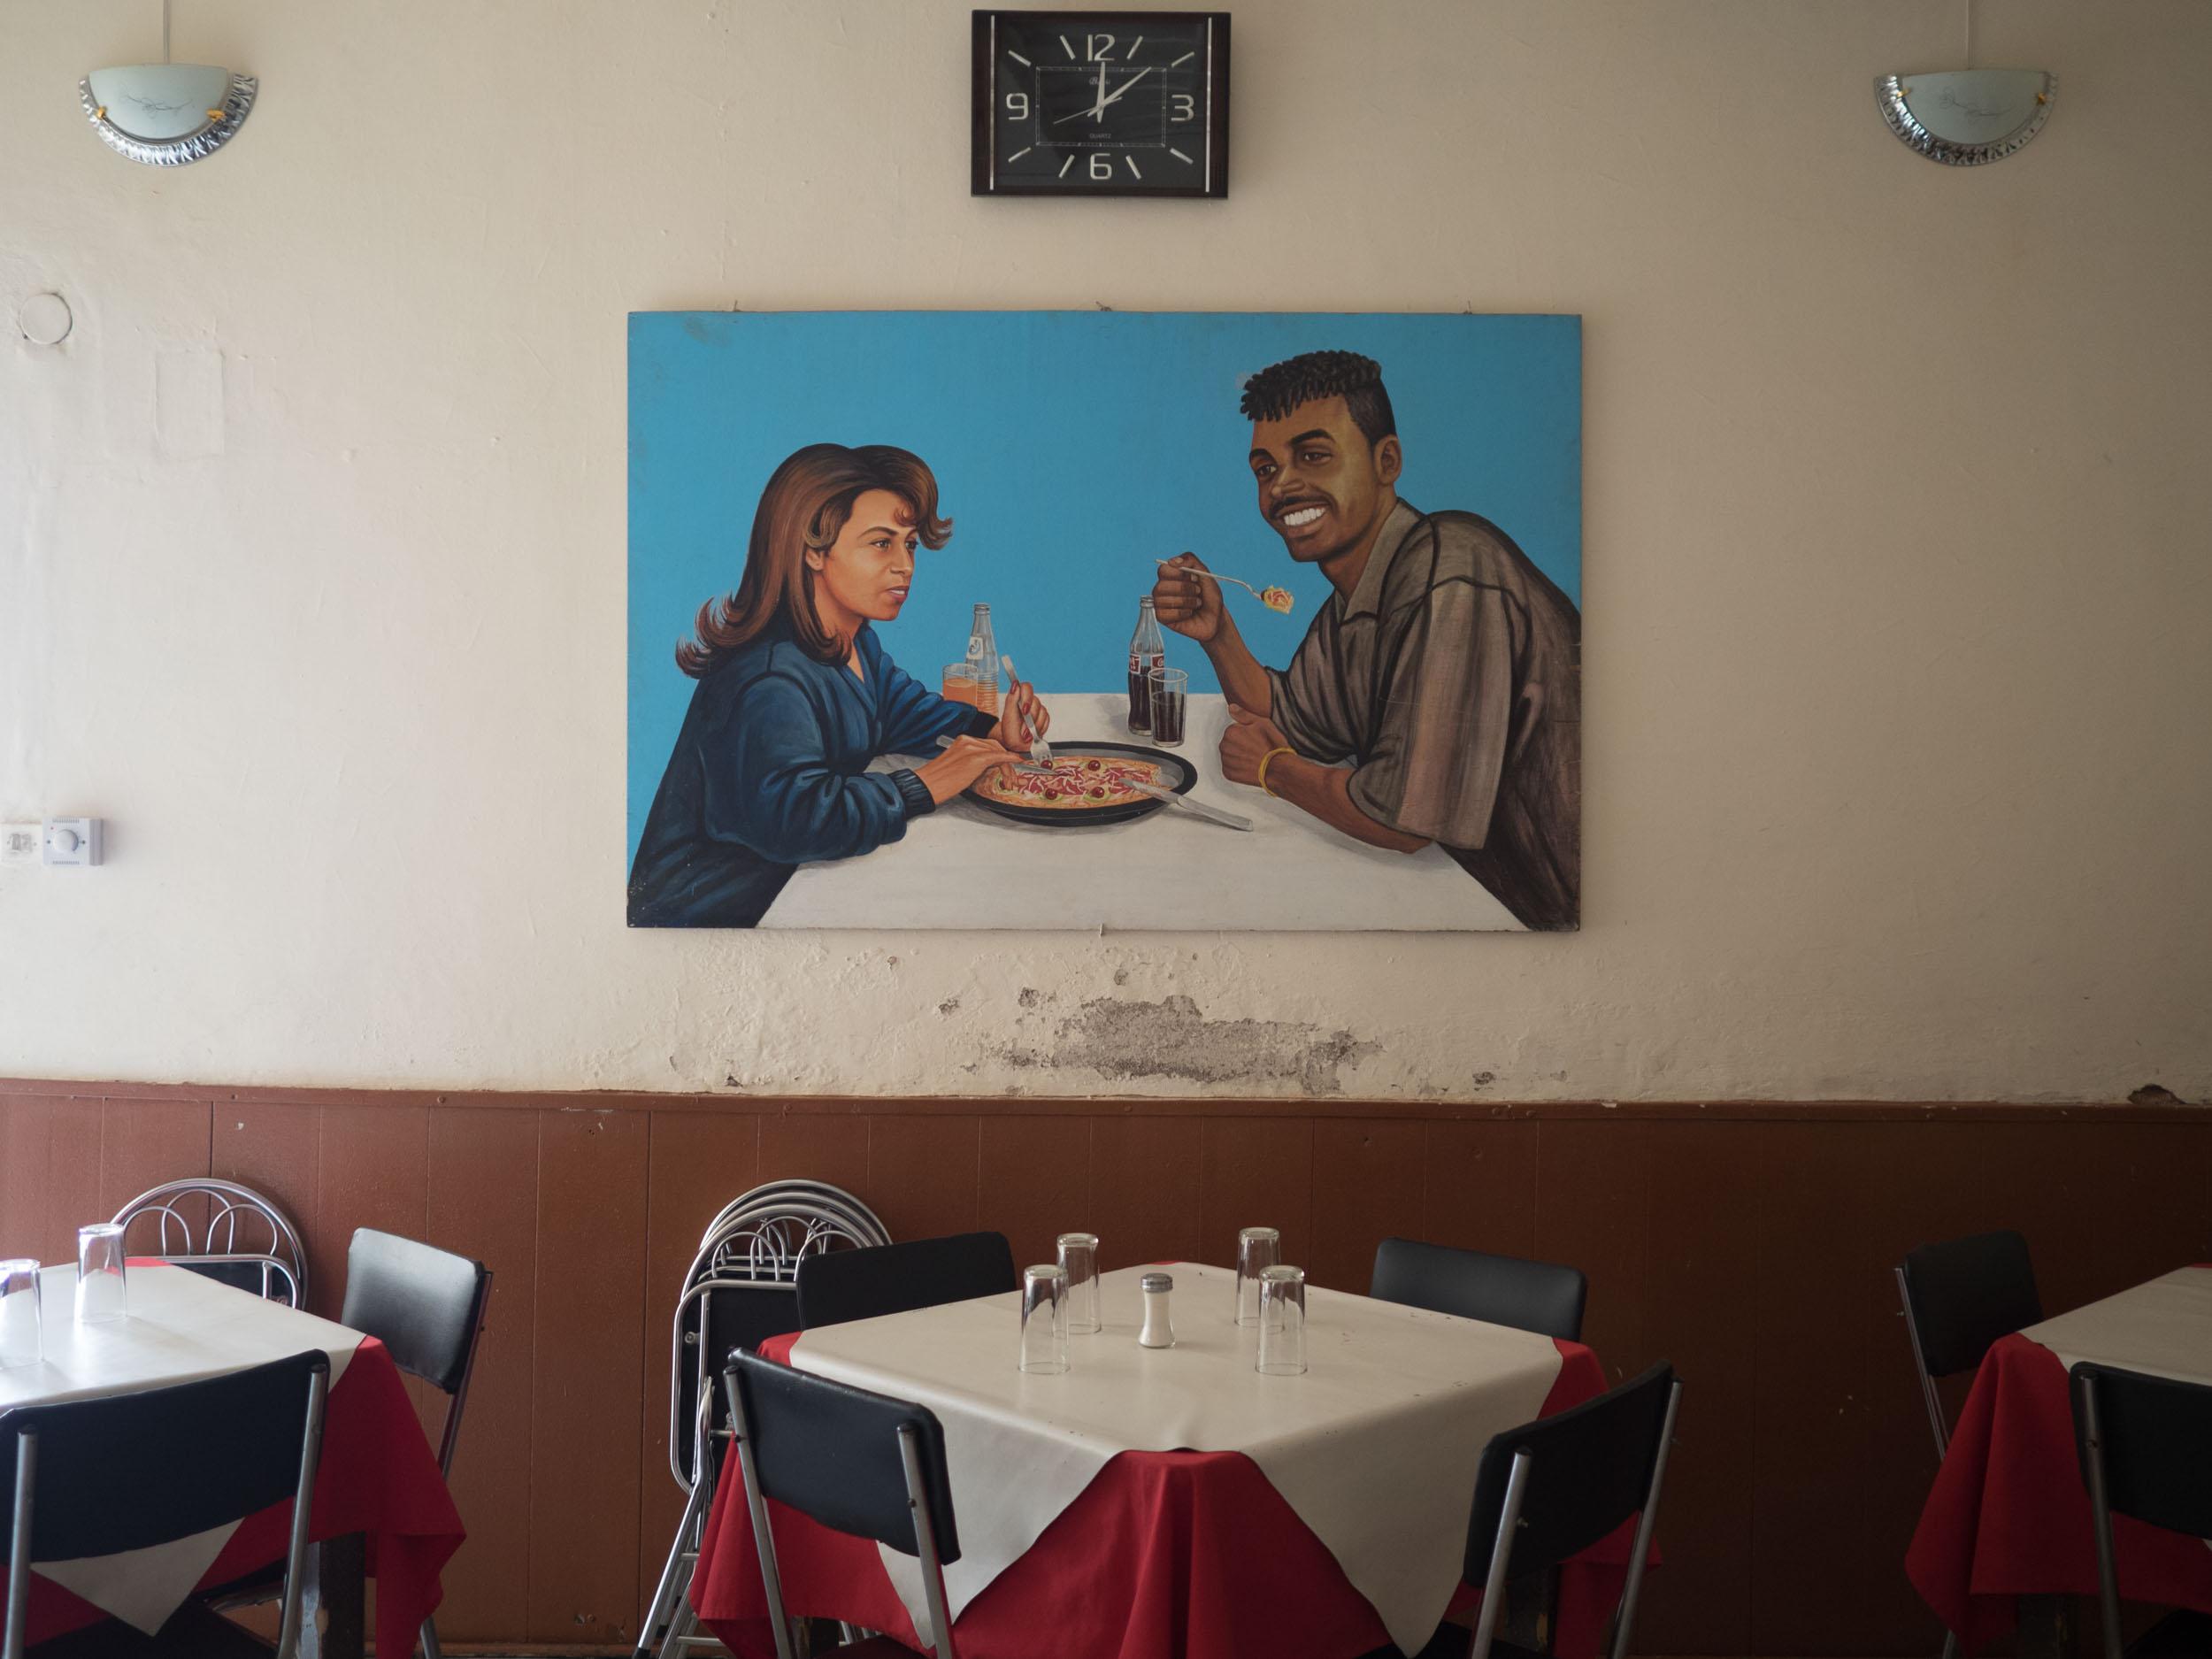 One of the best pizzeria in Asmara, Eritrea.